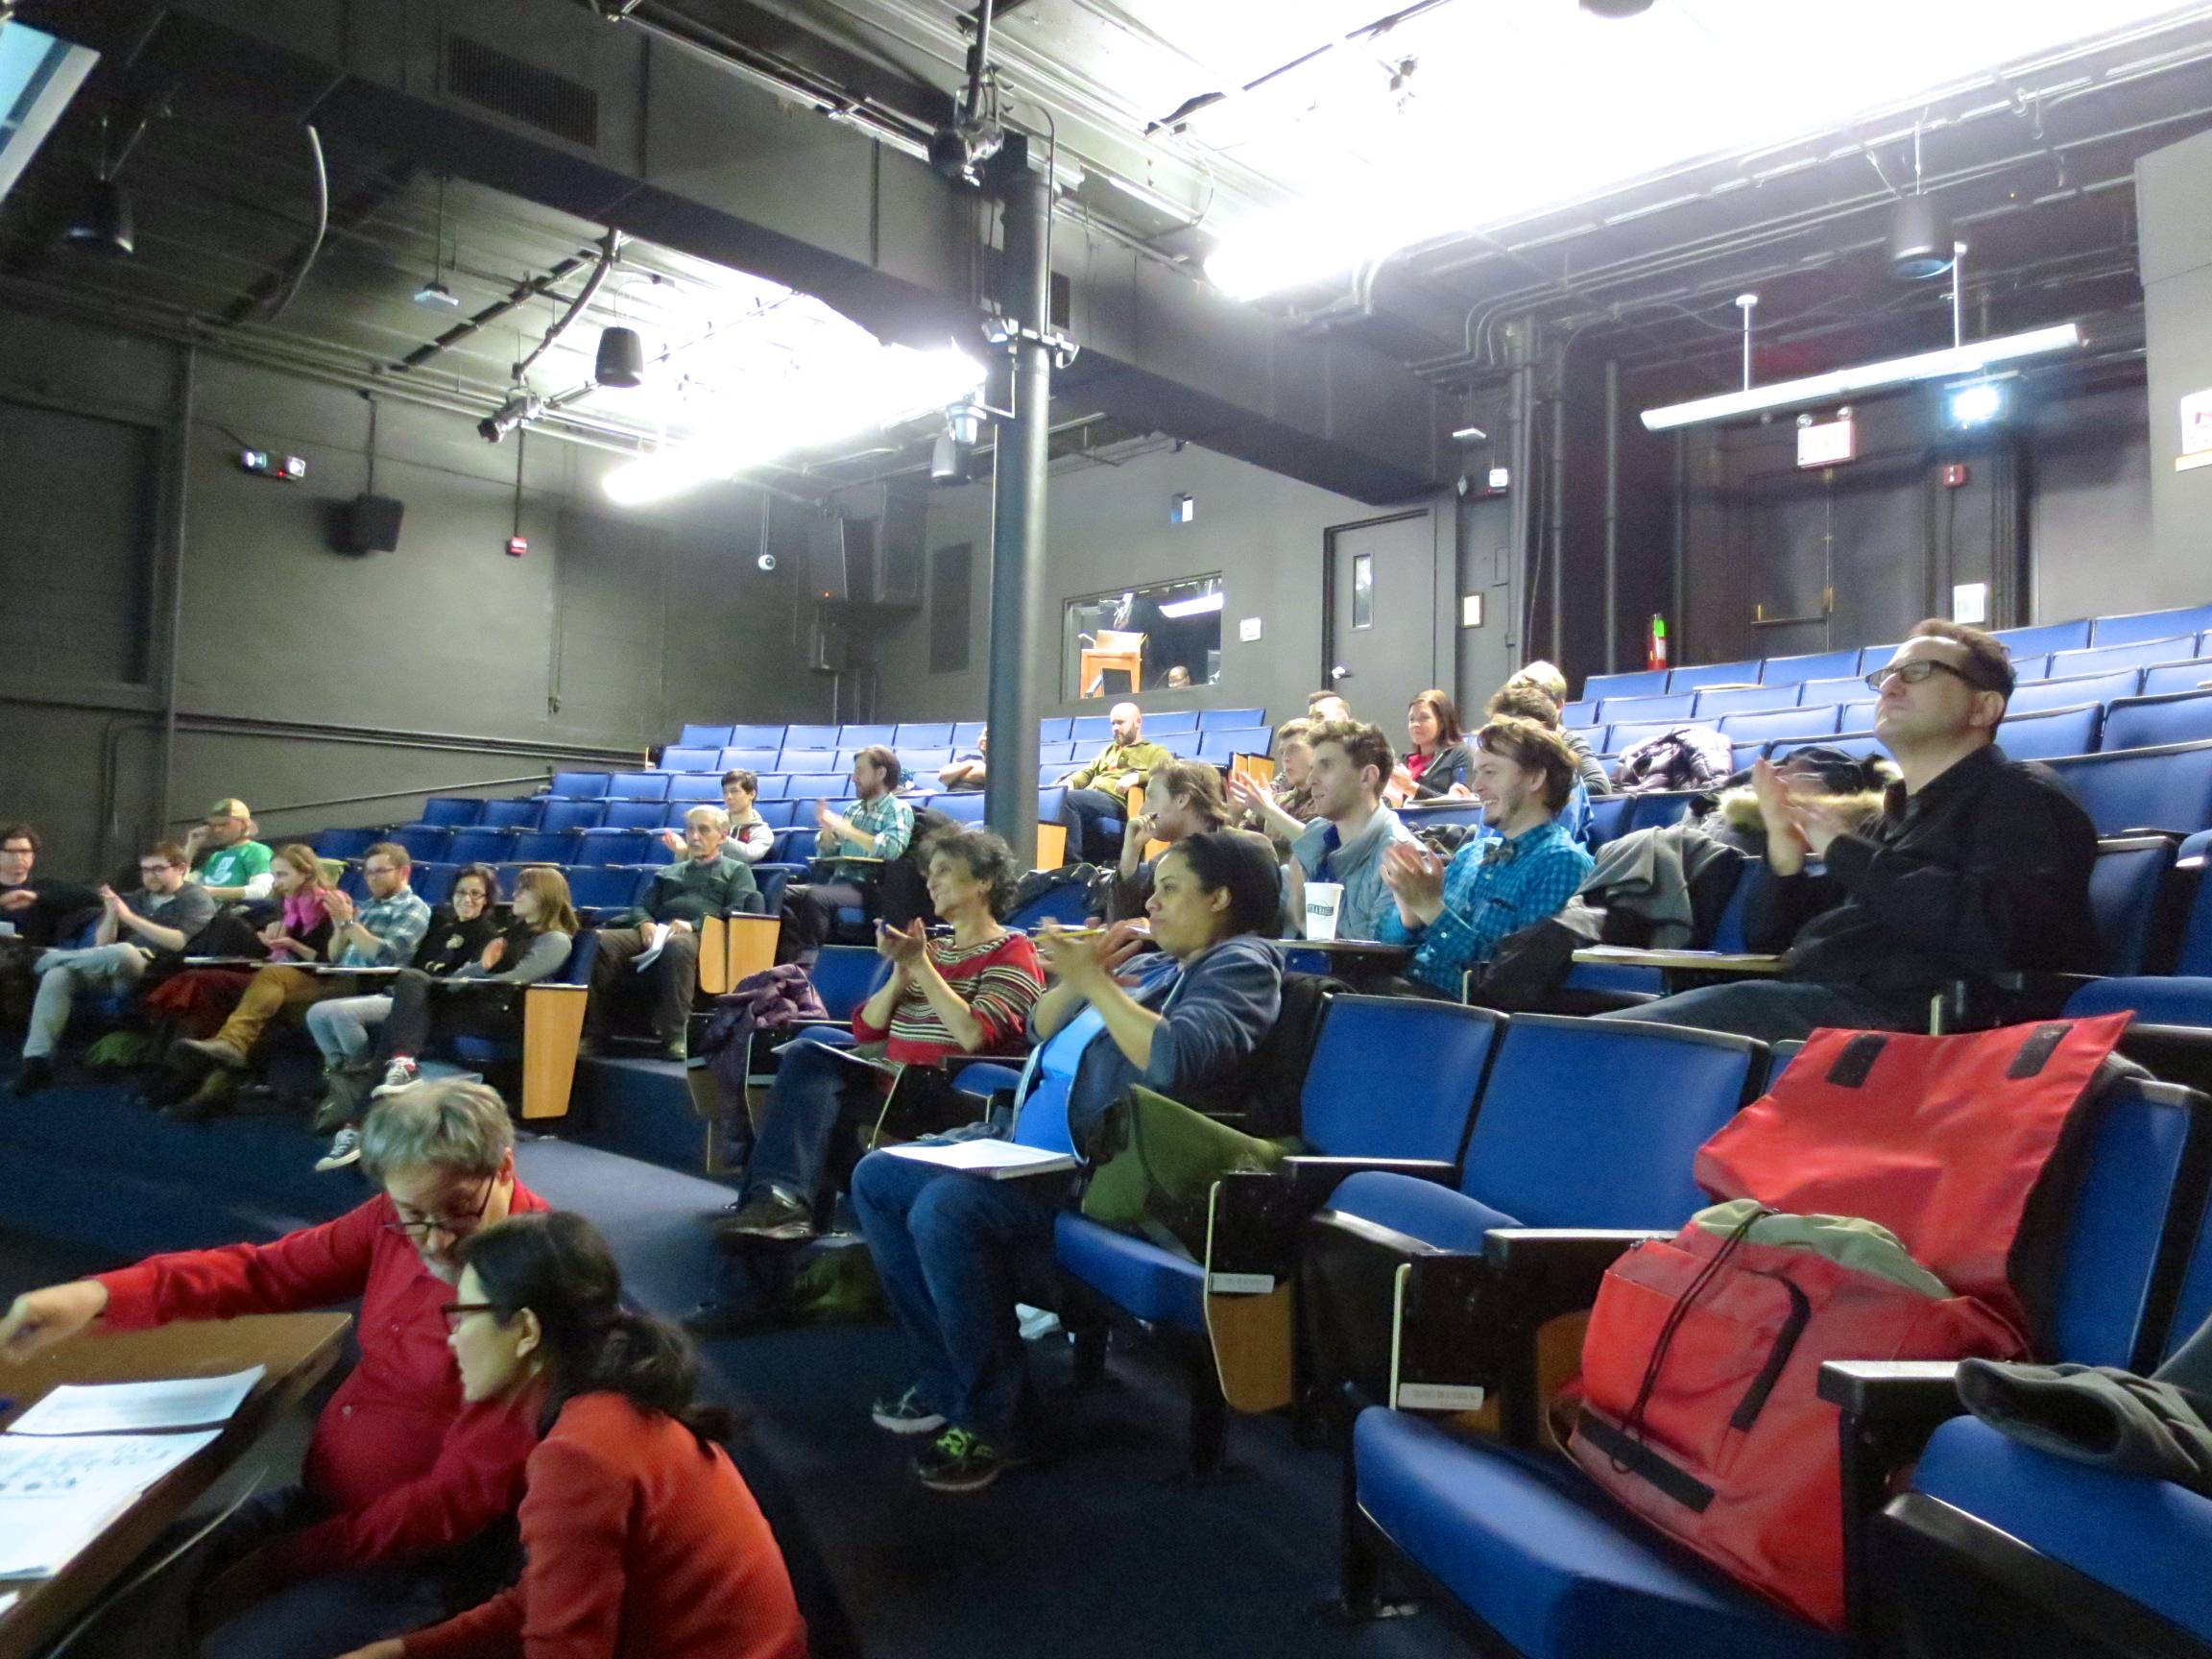 ASIFA-East Jury Screenings: Student Film Category